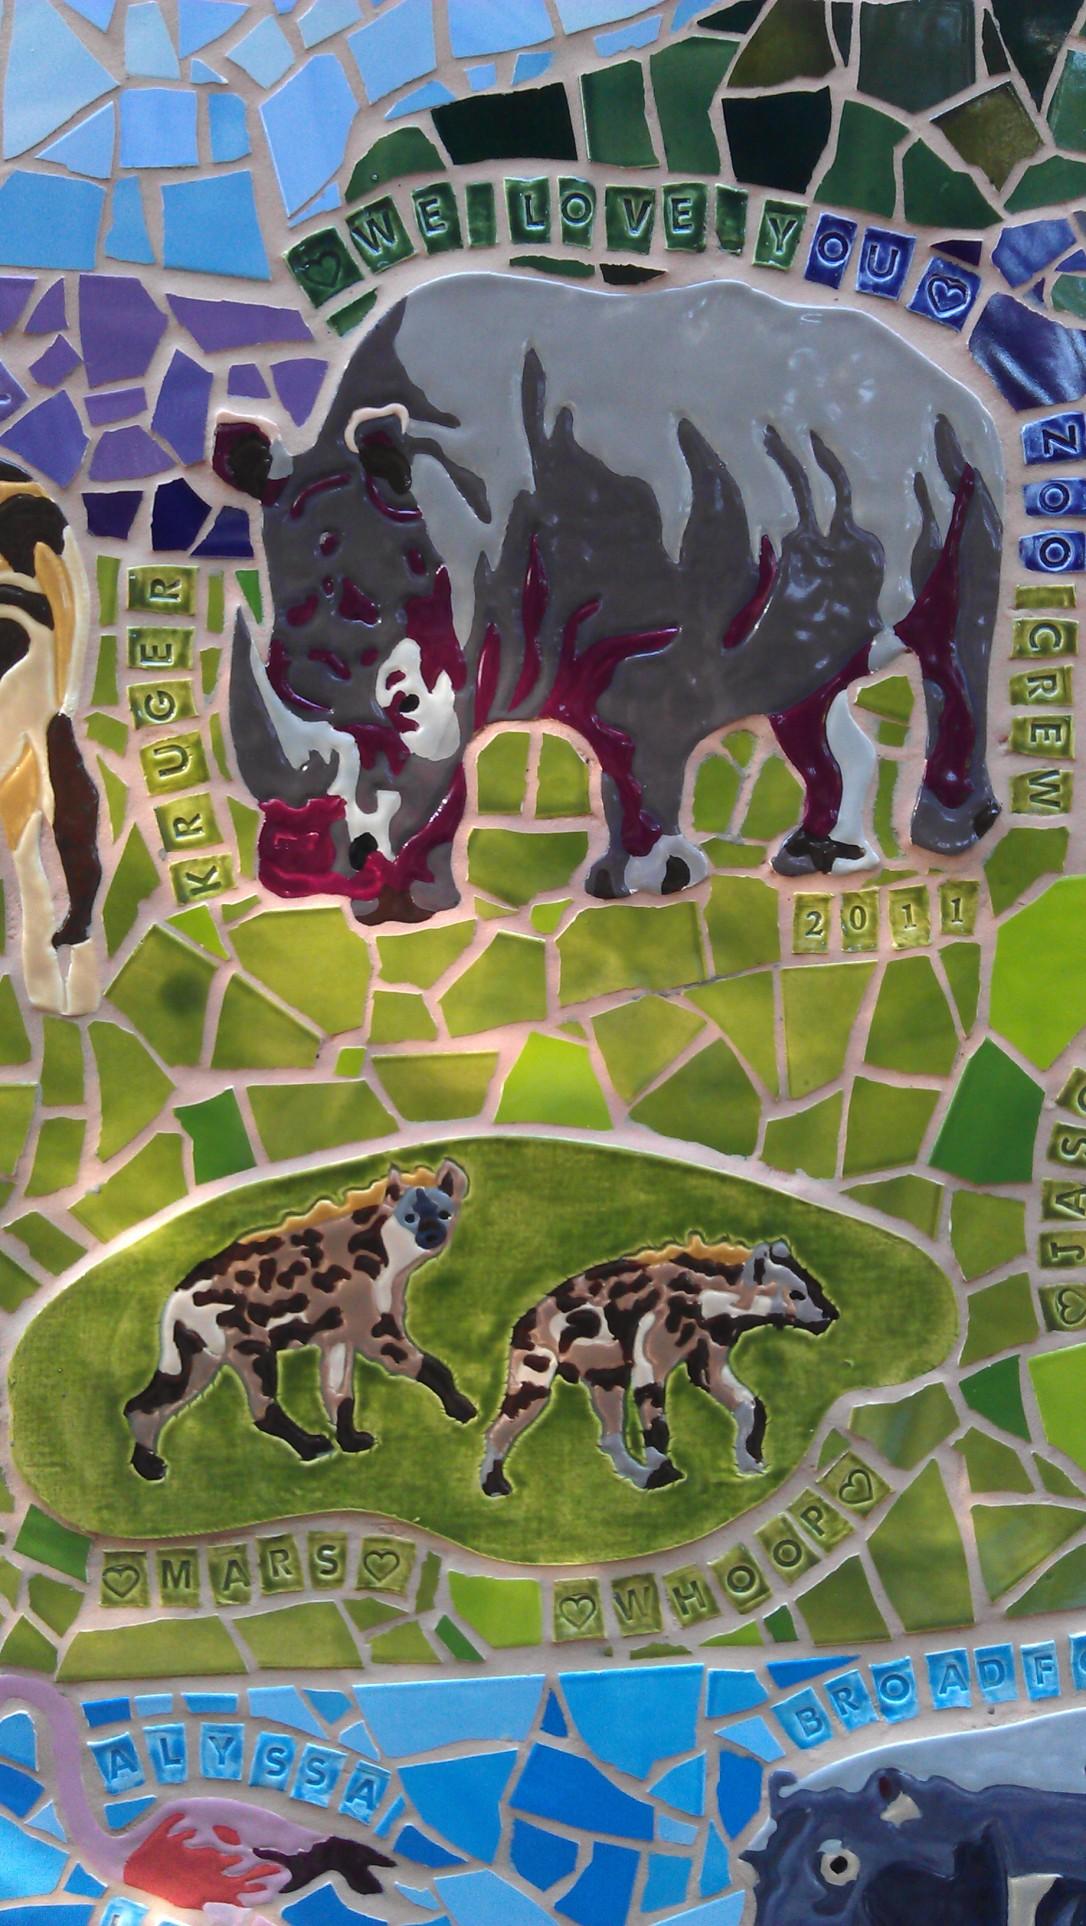 3/29/2012 Zoo Mosaic